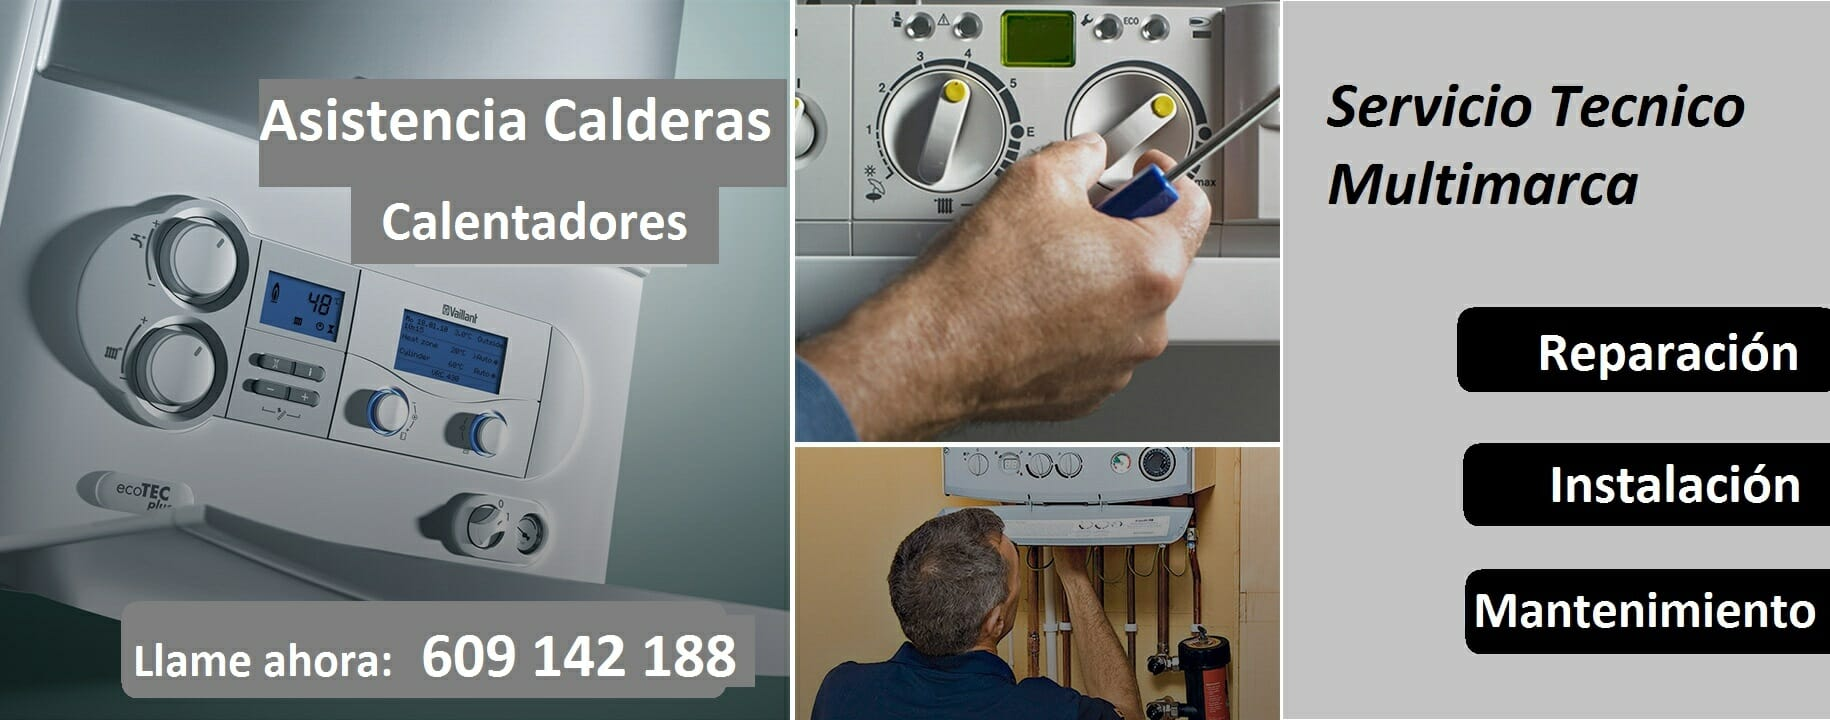 Reparación Calderas Barcelona